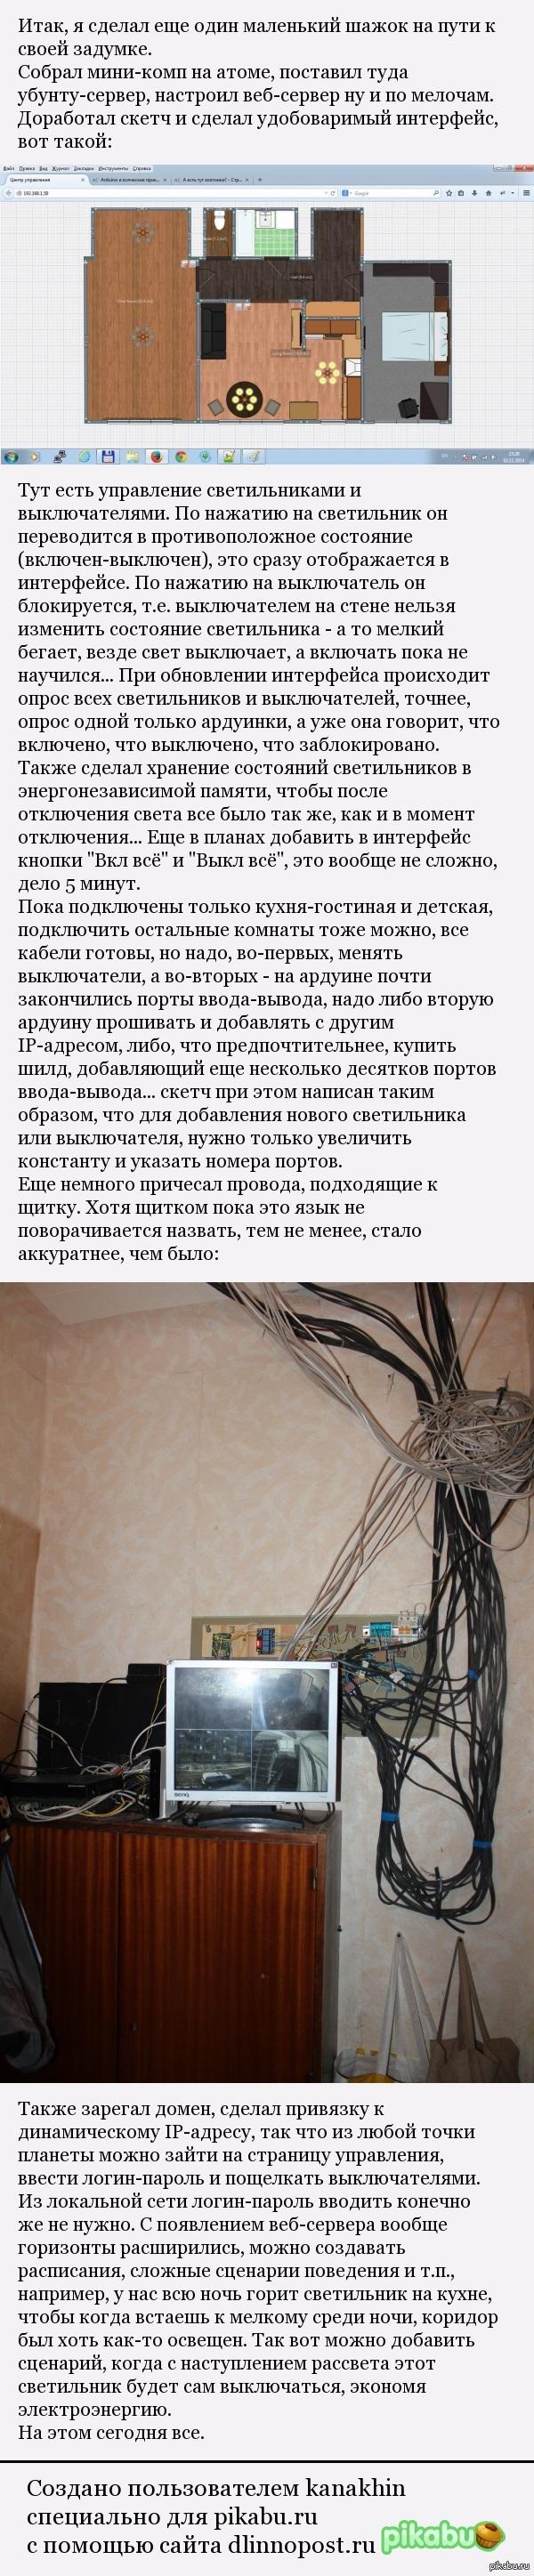 "Мой полоумный дом. Добавляем плюшек. в продолжение поста <a href=""http://pikabu.ru/story/prodolzhaya_temu_remonta_zachatki_avtomatiki_2545065"">http://pikabu.ru/story/_2545065</a>"